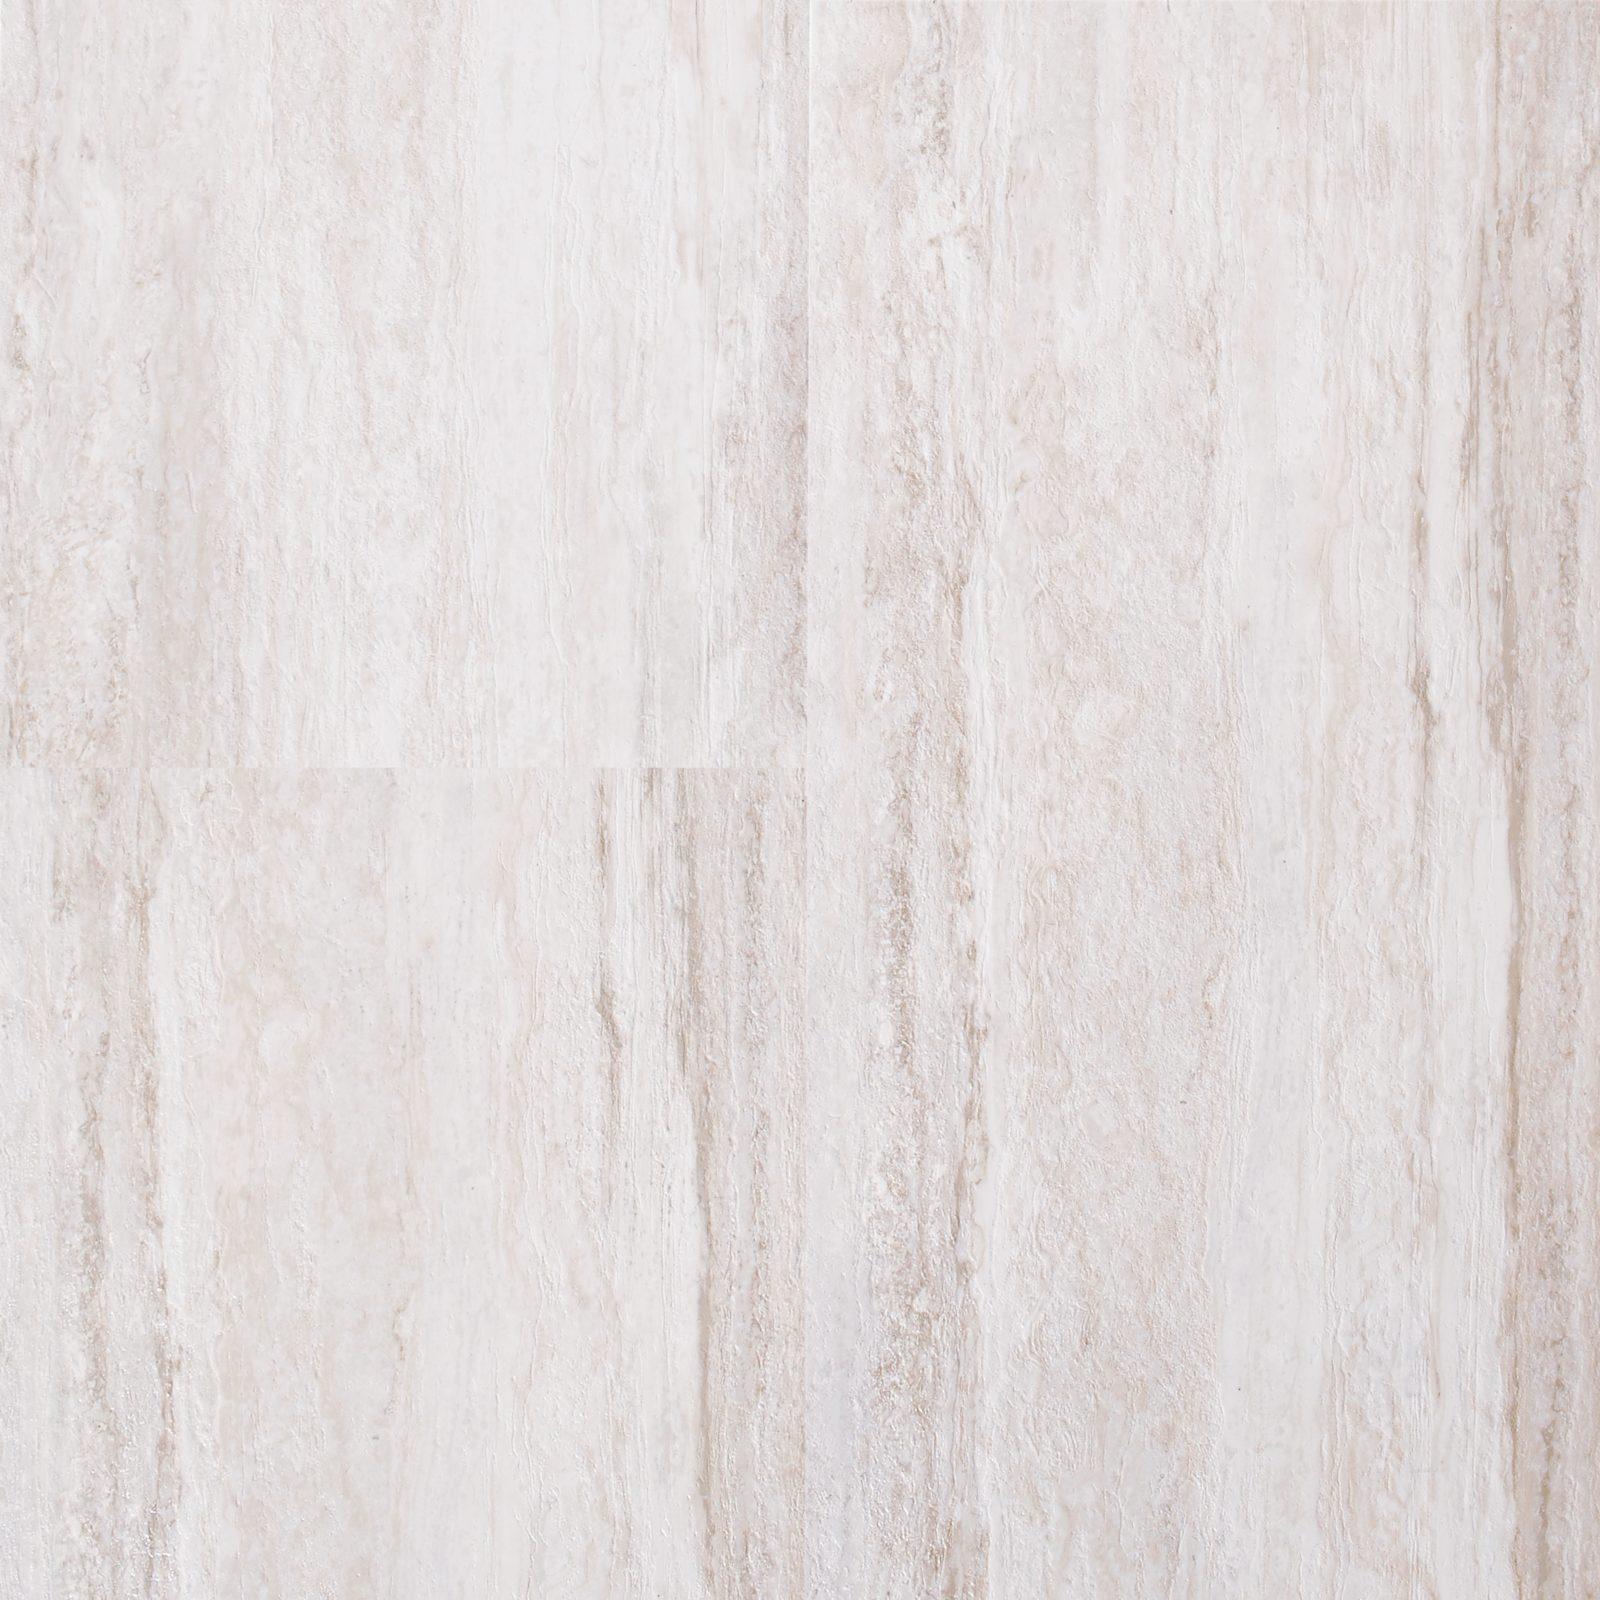 Adura max vinyl floor plank sea mist mar111 12 x 24 for Max floor